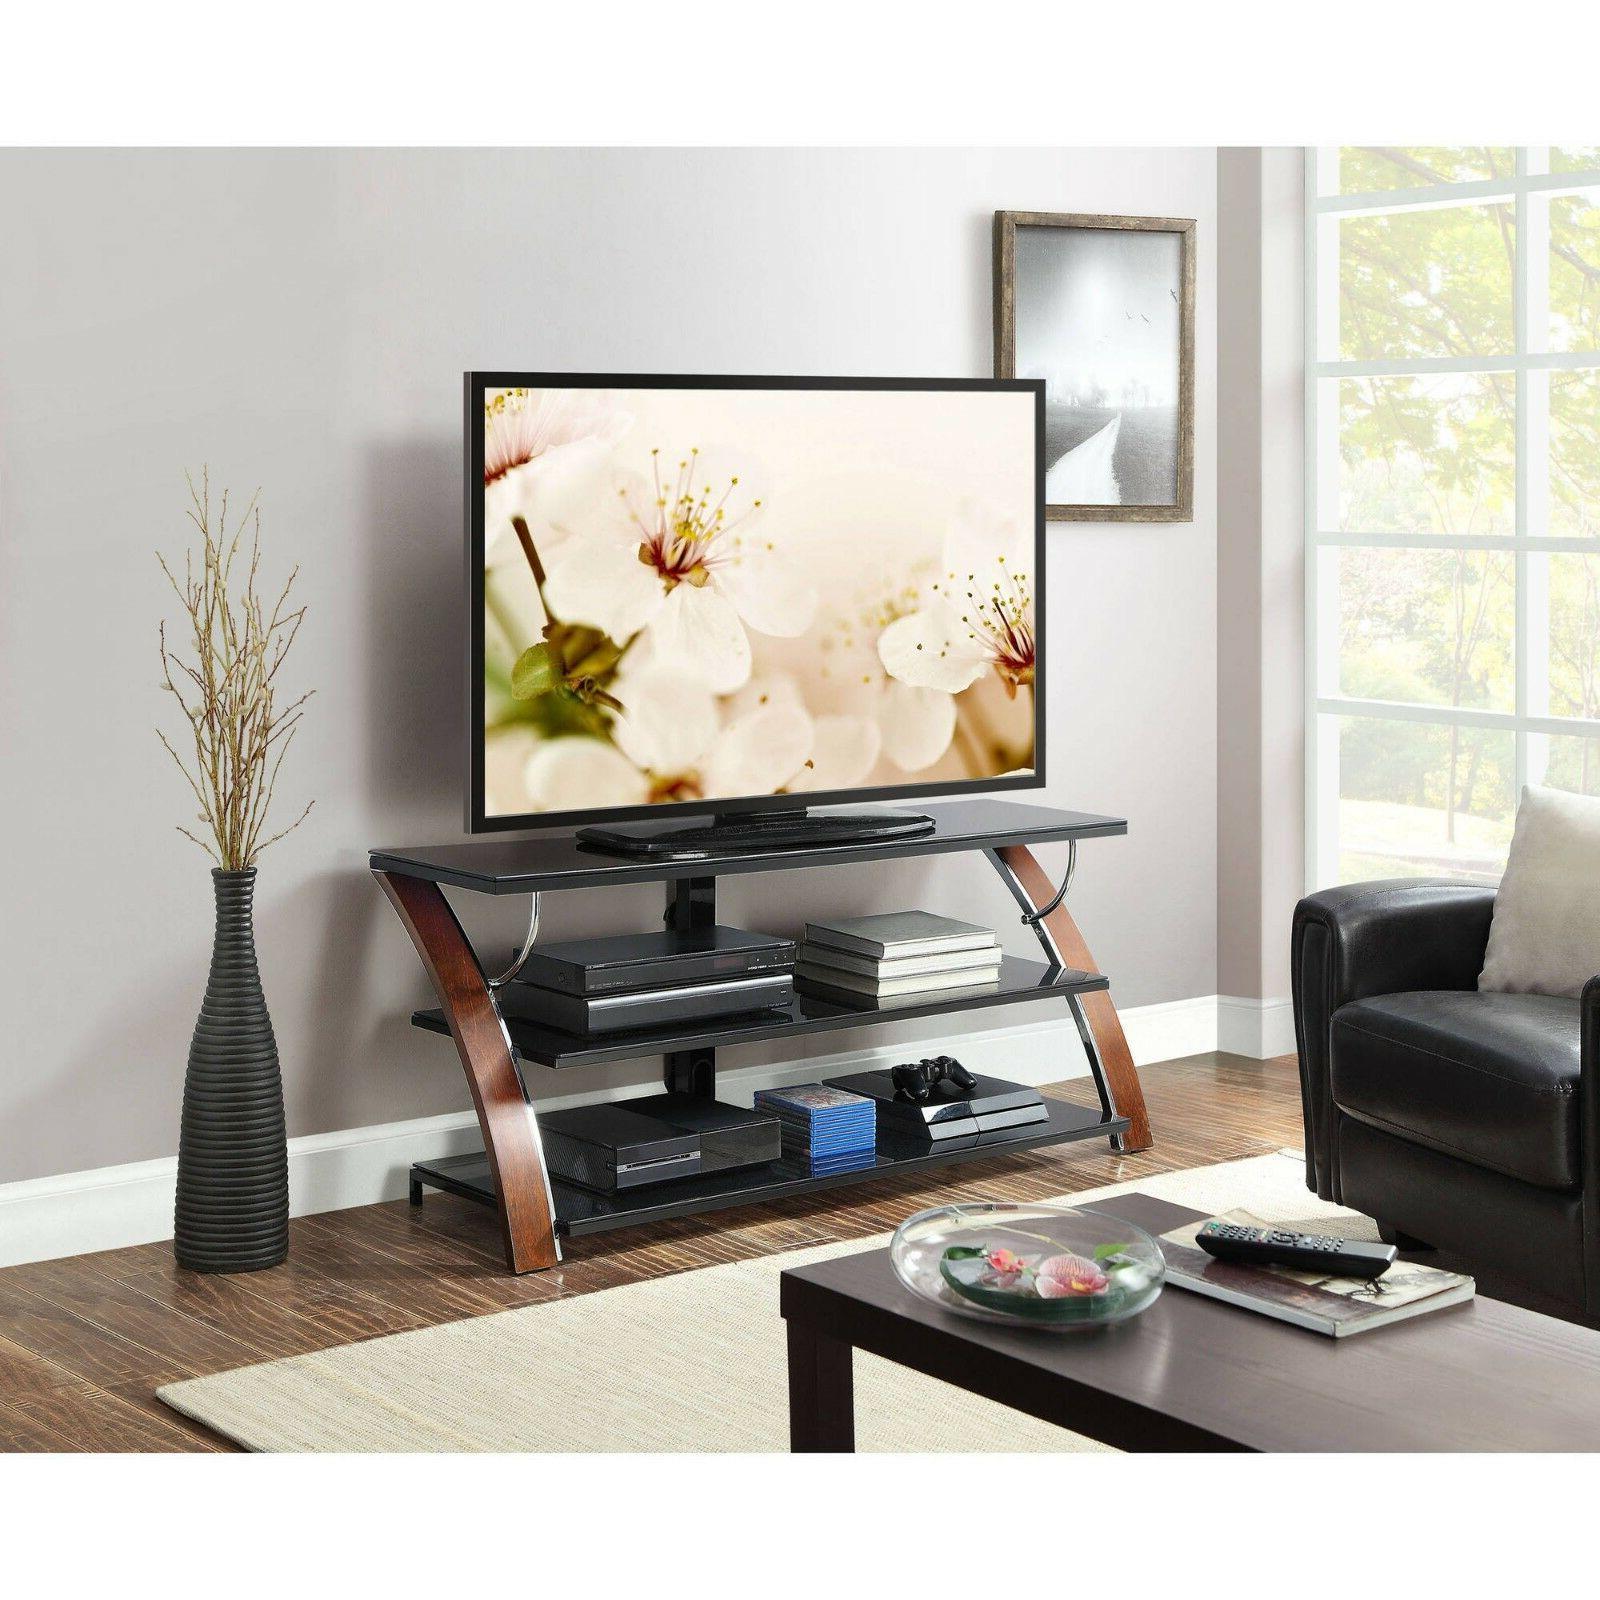 "Whalen Payton Brown Cherry 3-in-1 Flat Stand TVs to 65"" shelf"